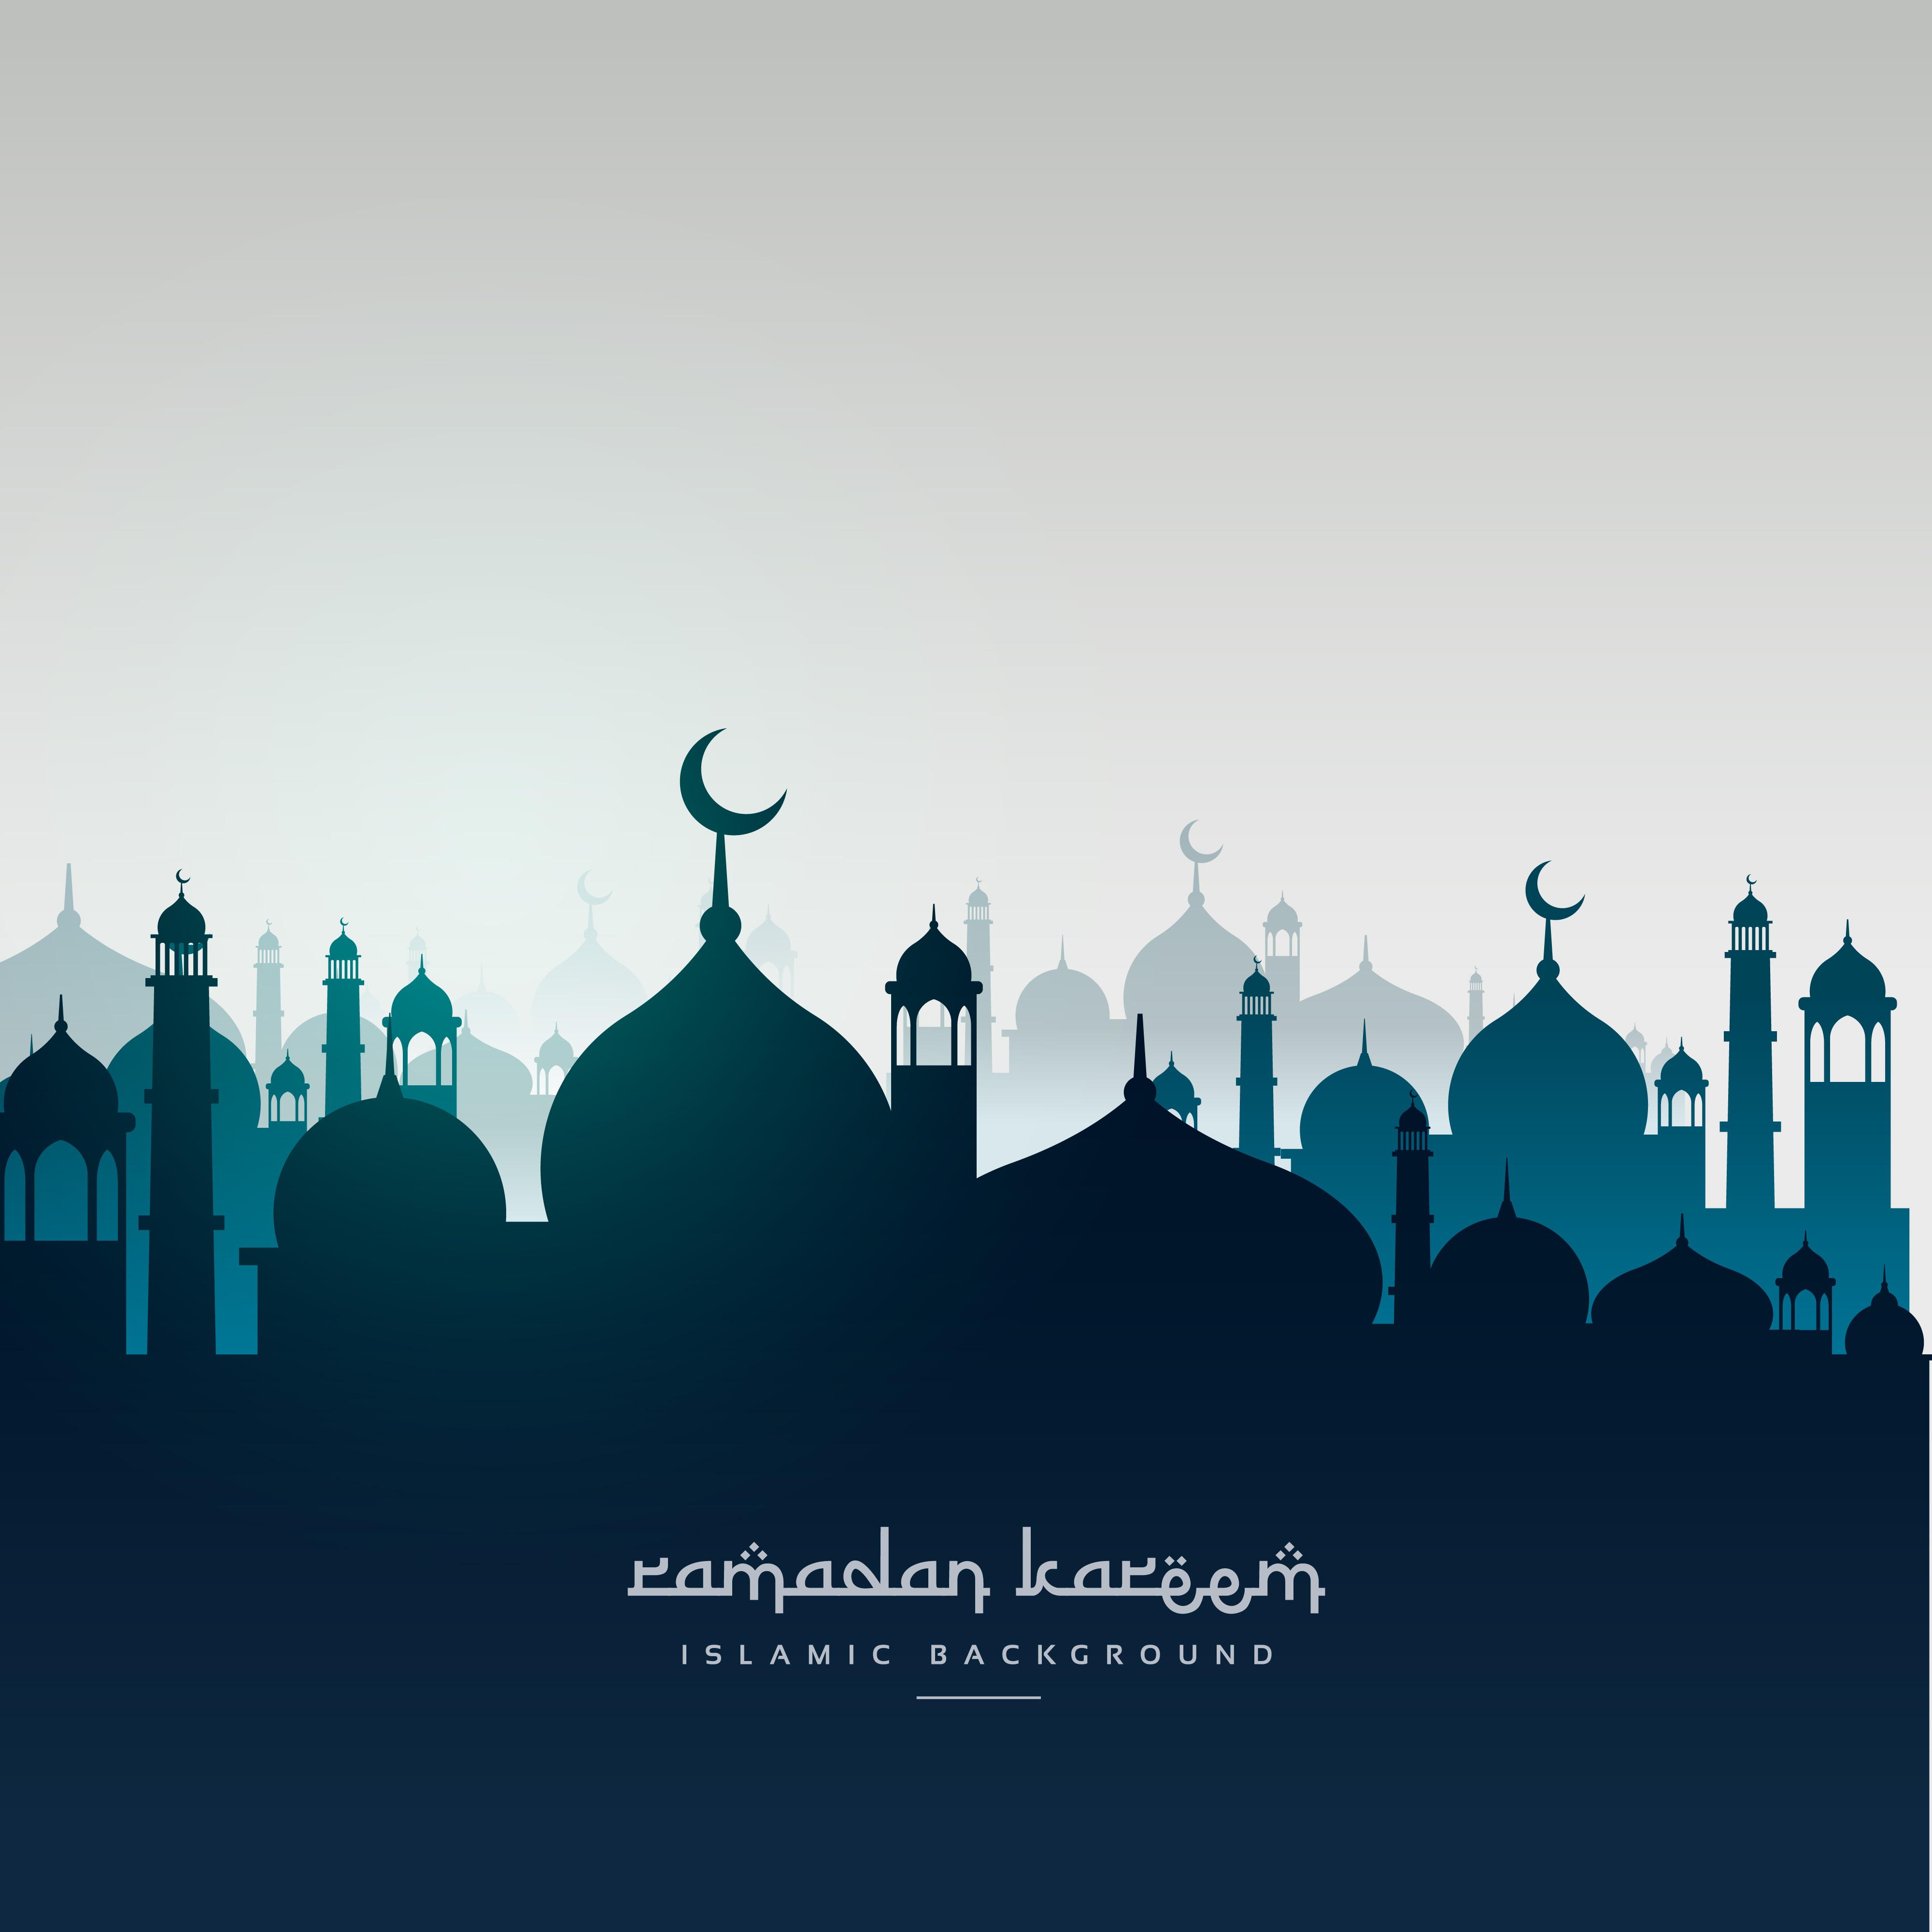 Mosque Free Vector Art 2660 Free Downloads